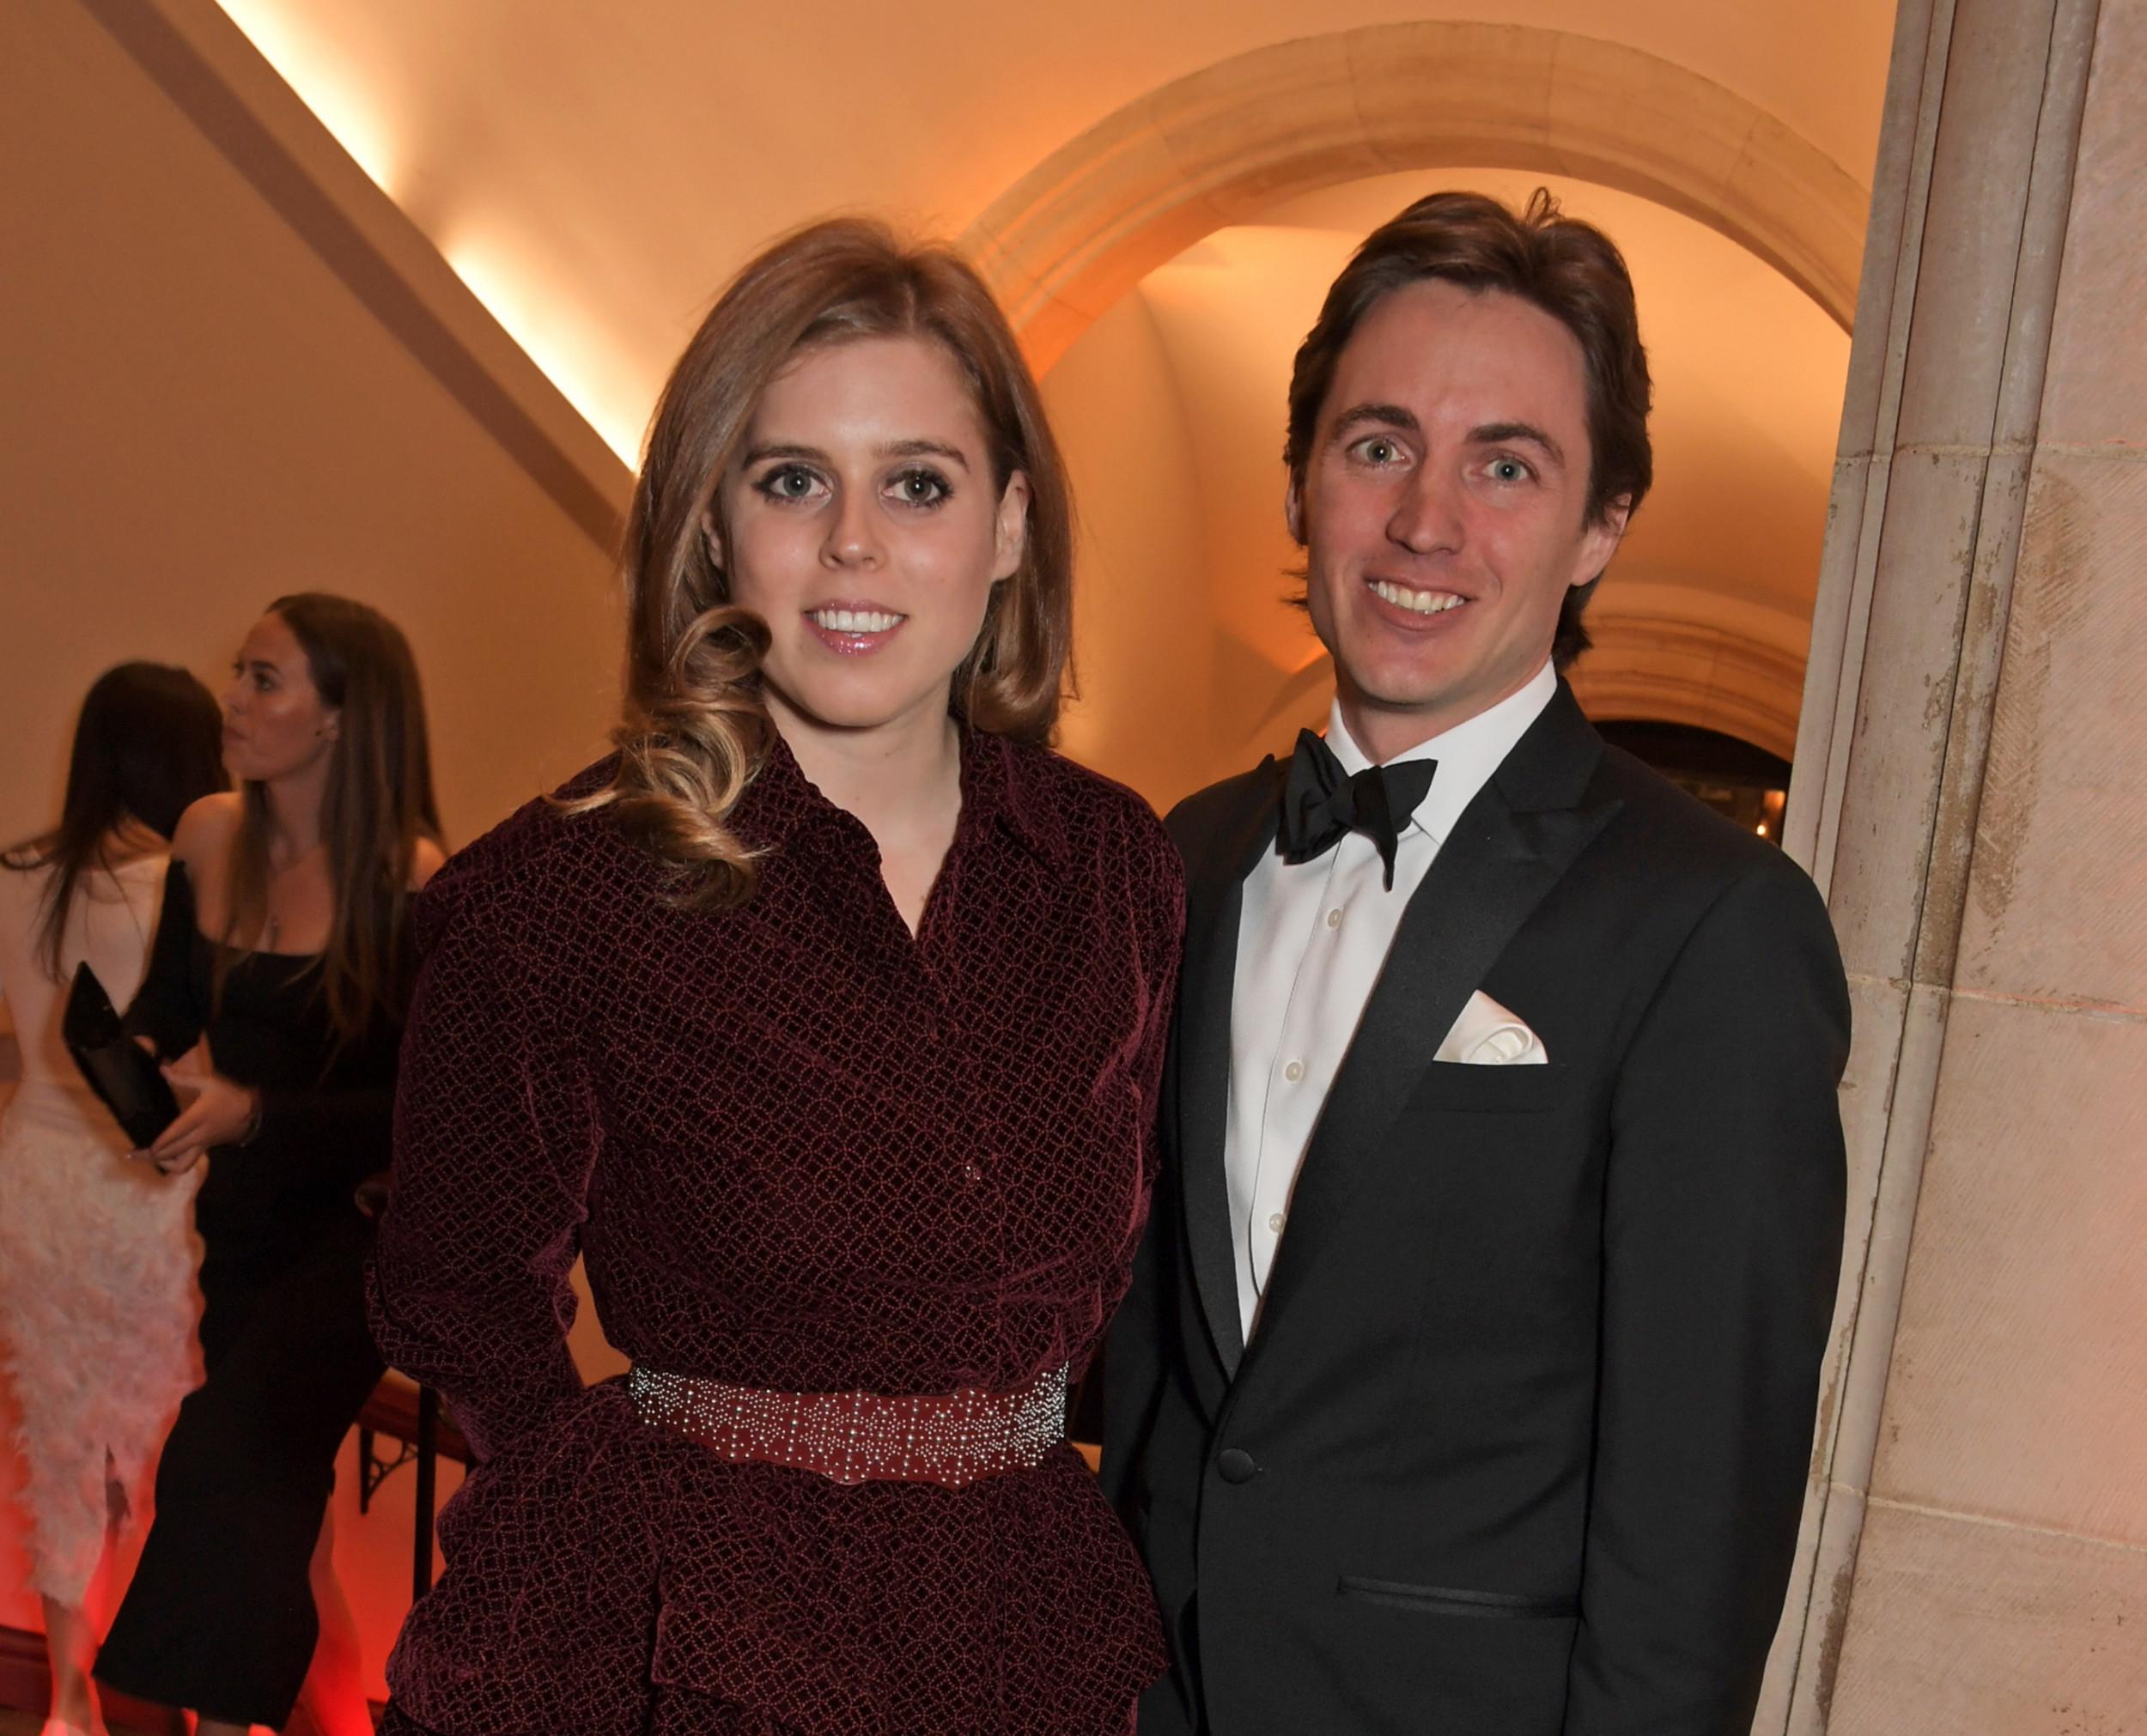 Princess Beatrice stuns in black for date night with husband Edoardo Mapelli Mozzi